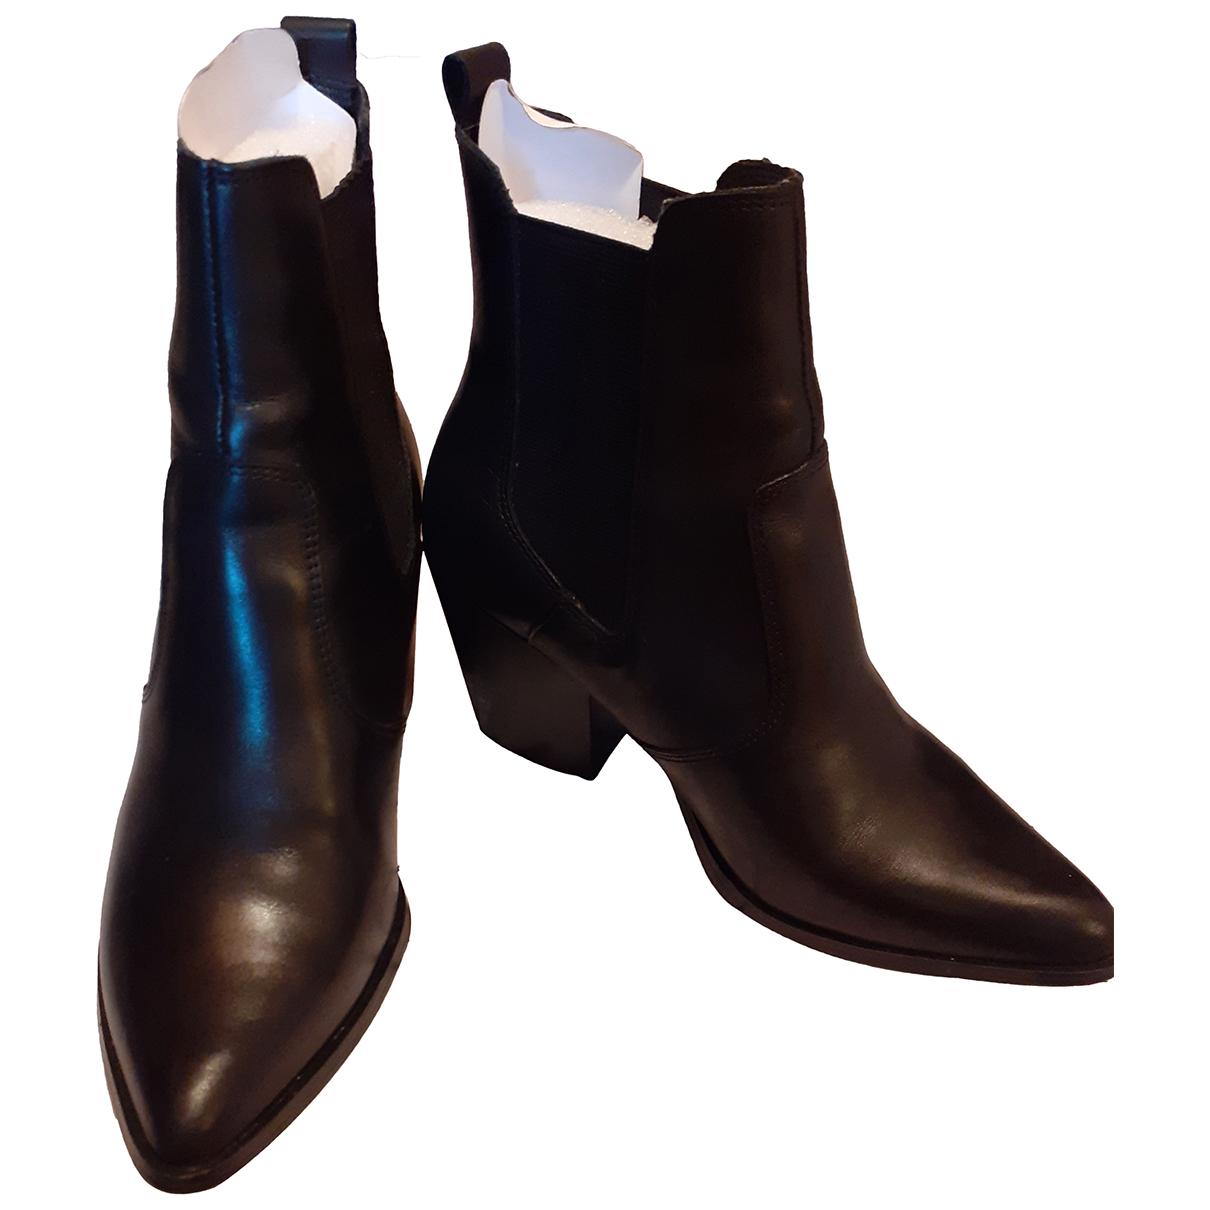 Steve Madden - Boots   pour femme en cuir - noir